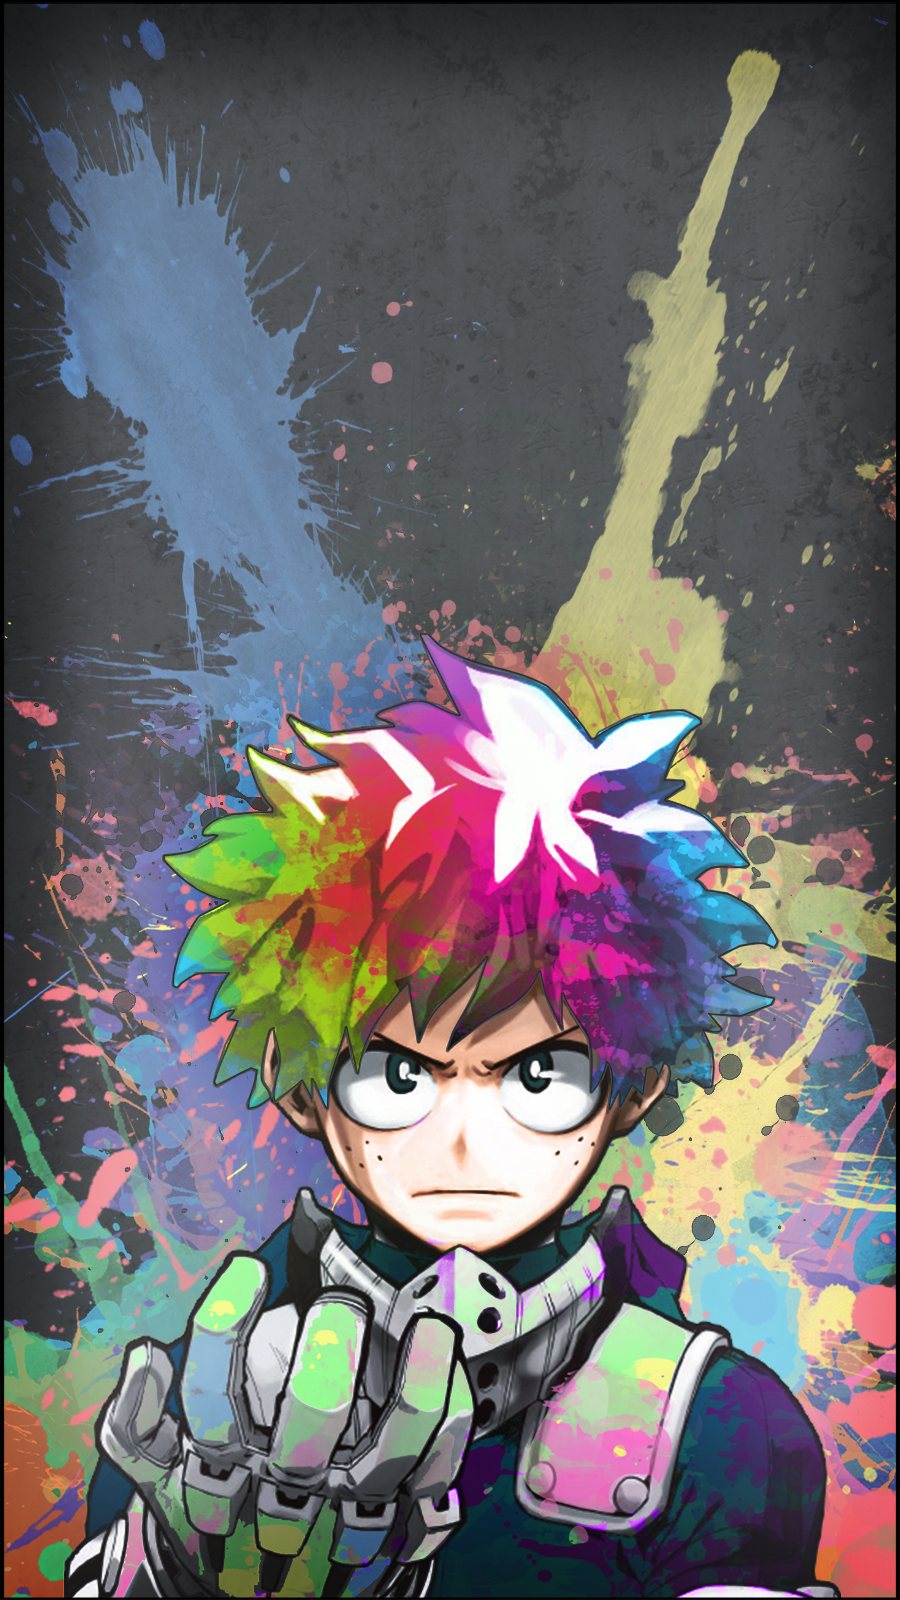 Anime Wallpaper HD: Animevibe Wallpaper Iphone